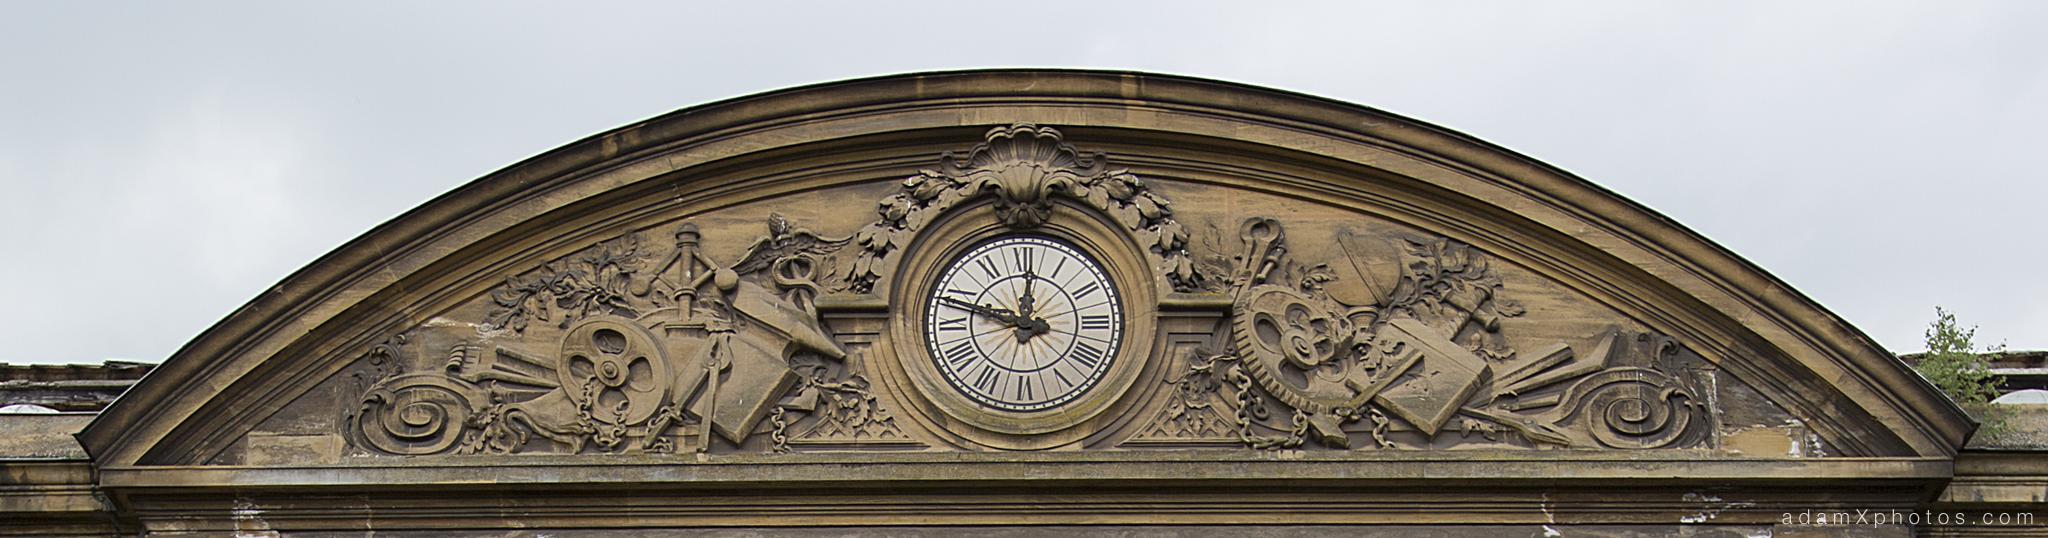 clockfacedetail